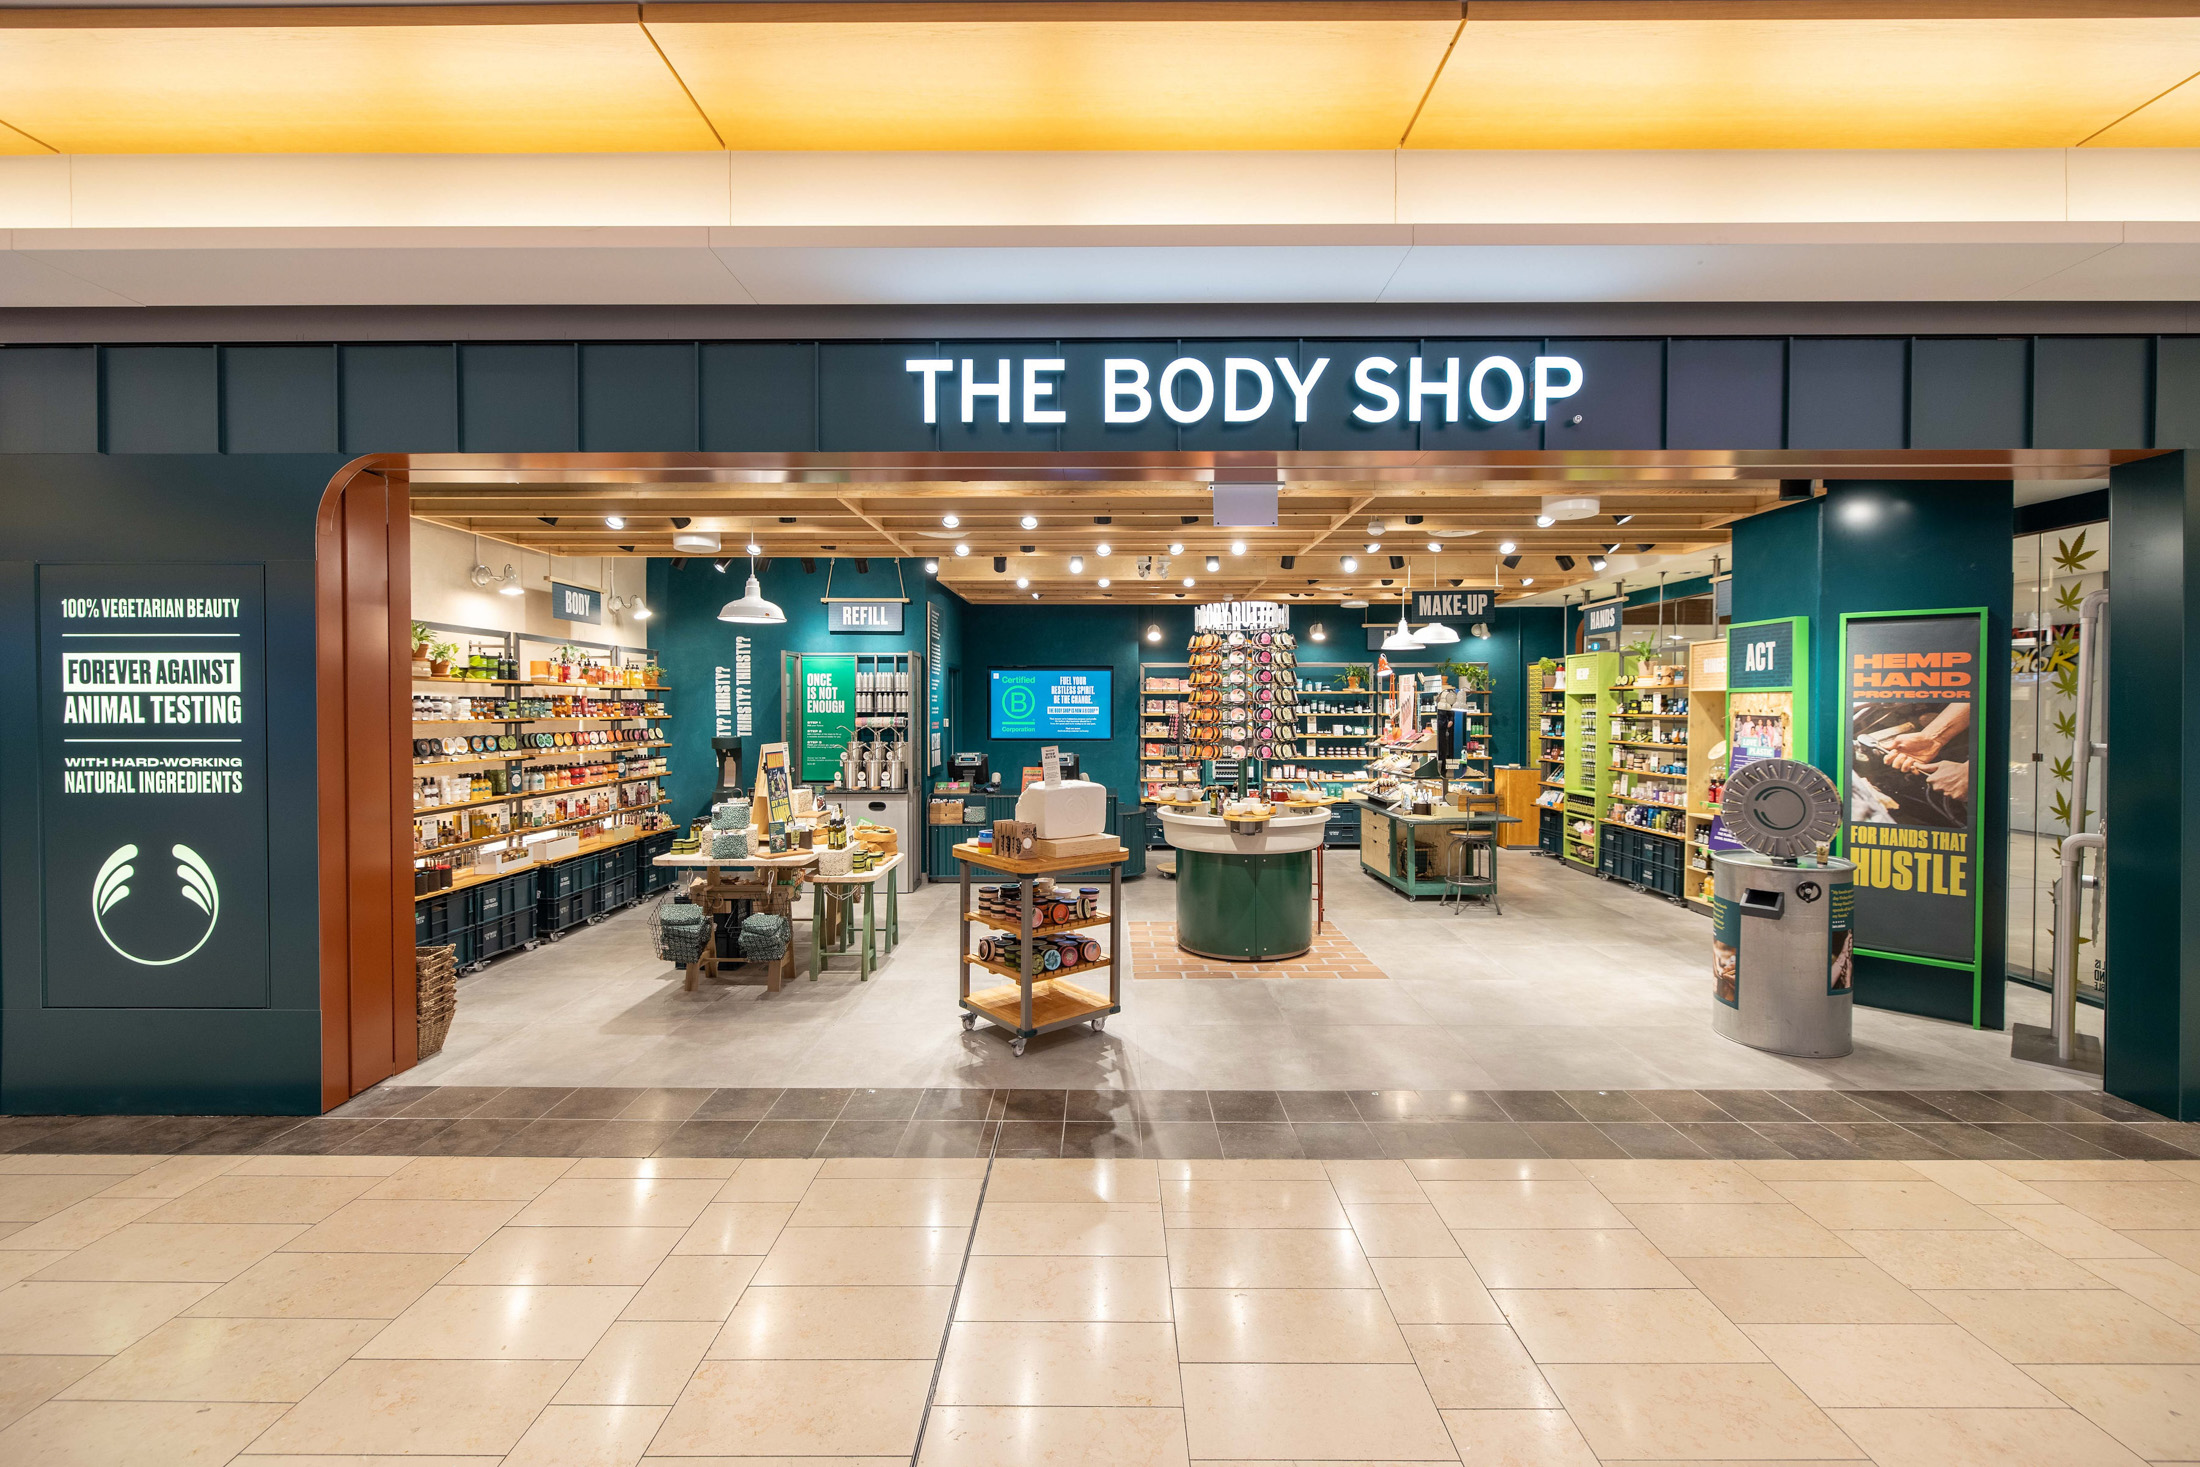 Body Shop concept store